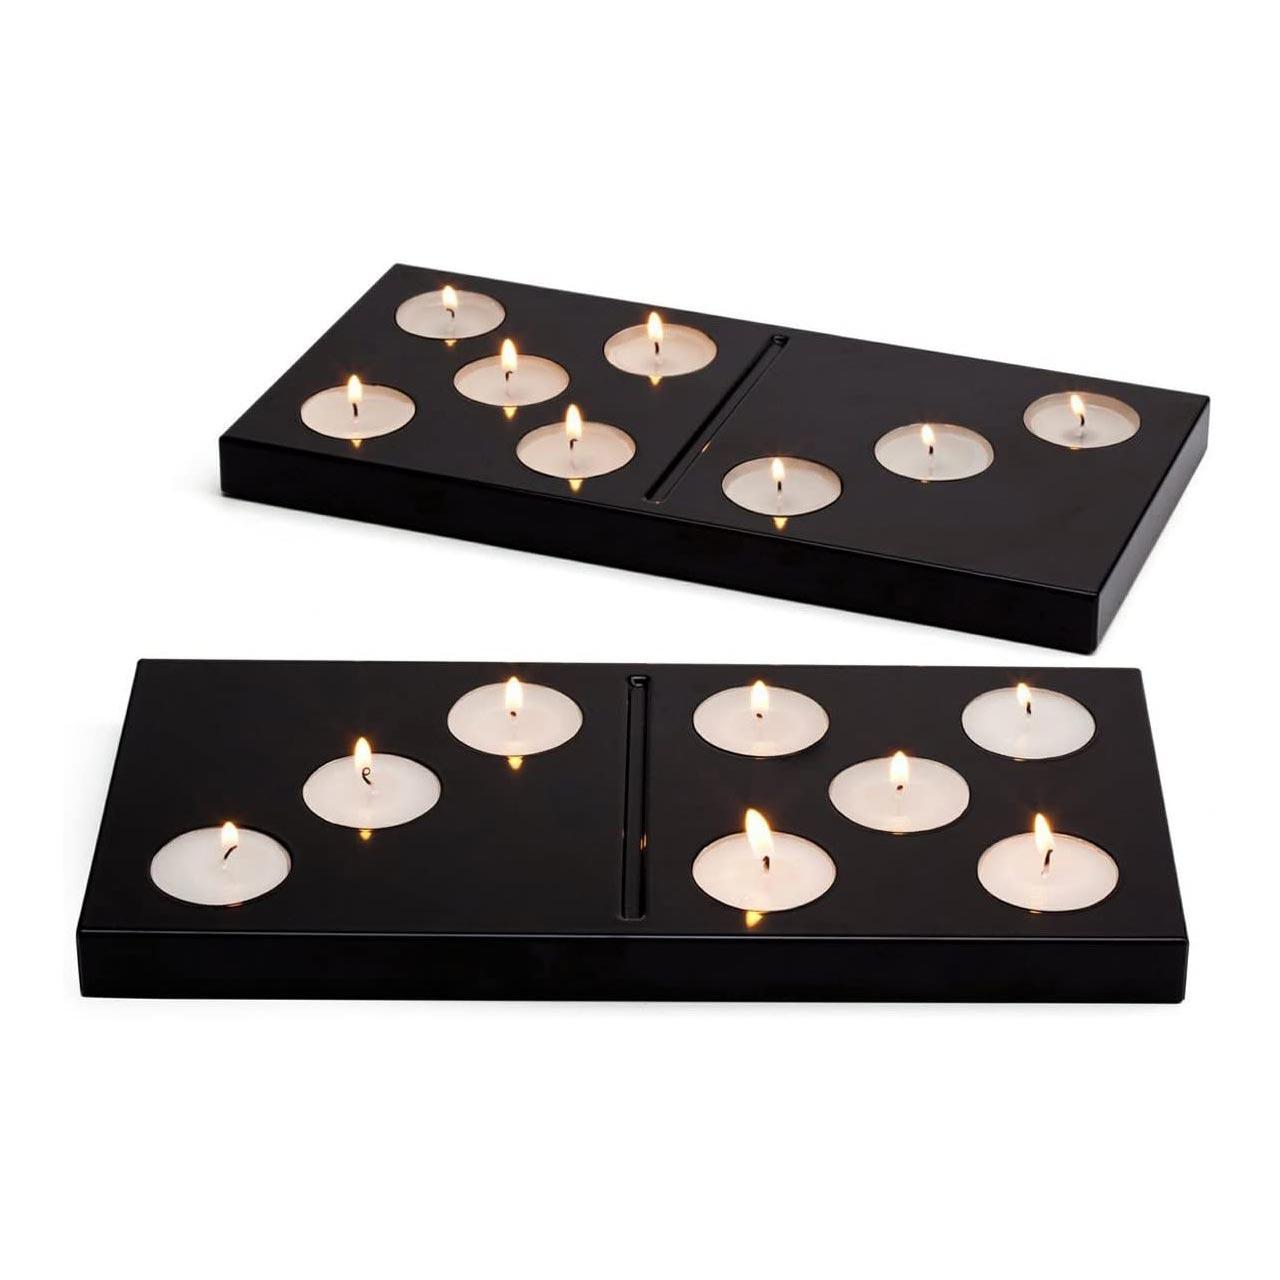 Peleg Design Domino Tea Light Candle Holder Black   the design gift shop